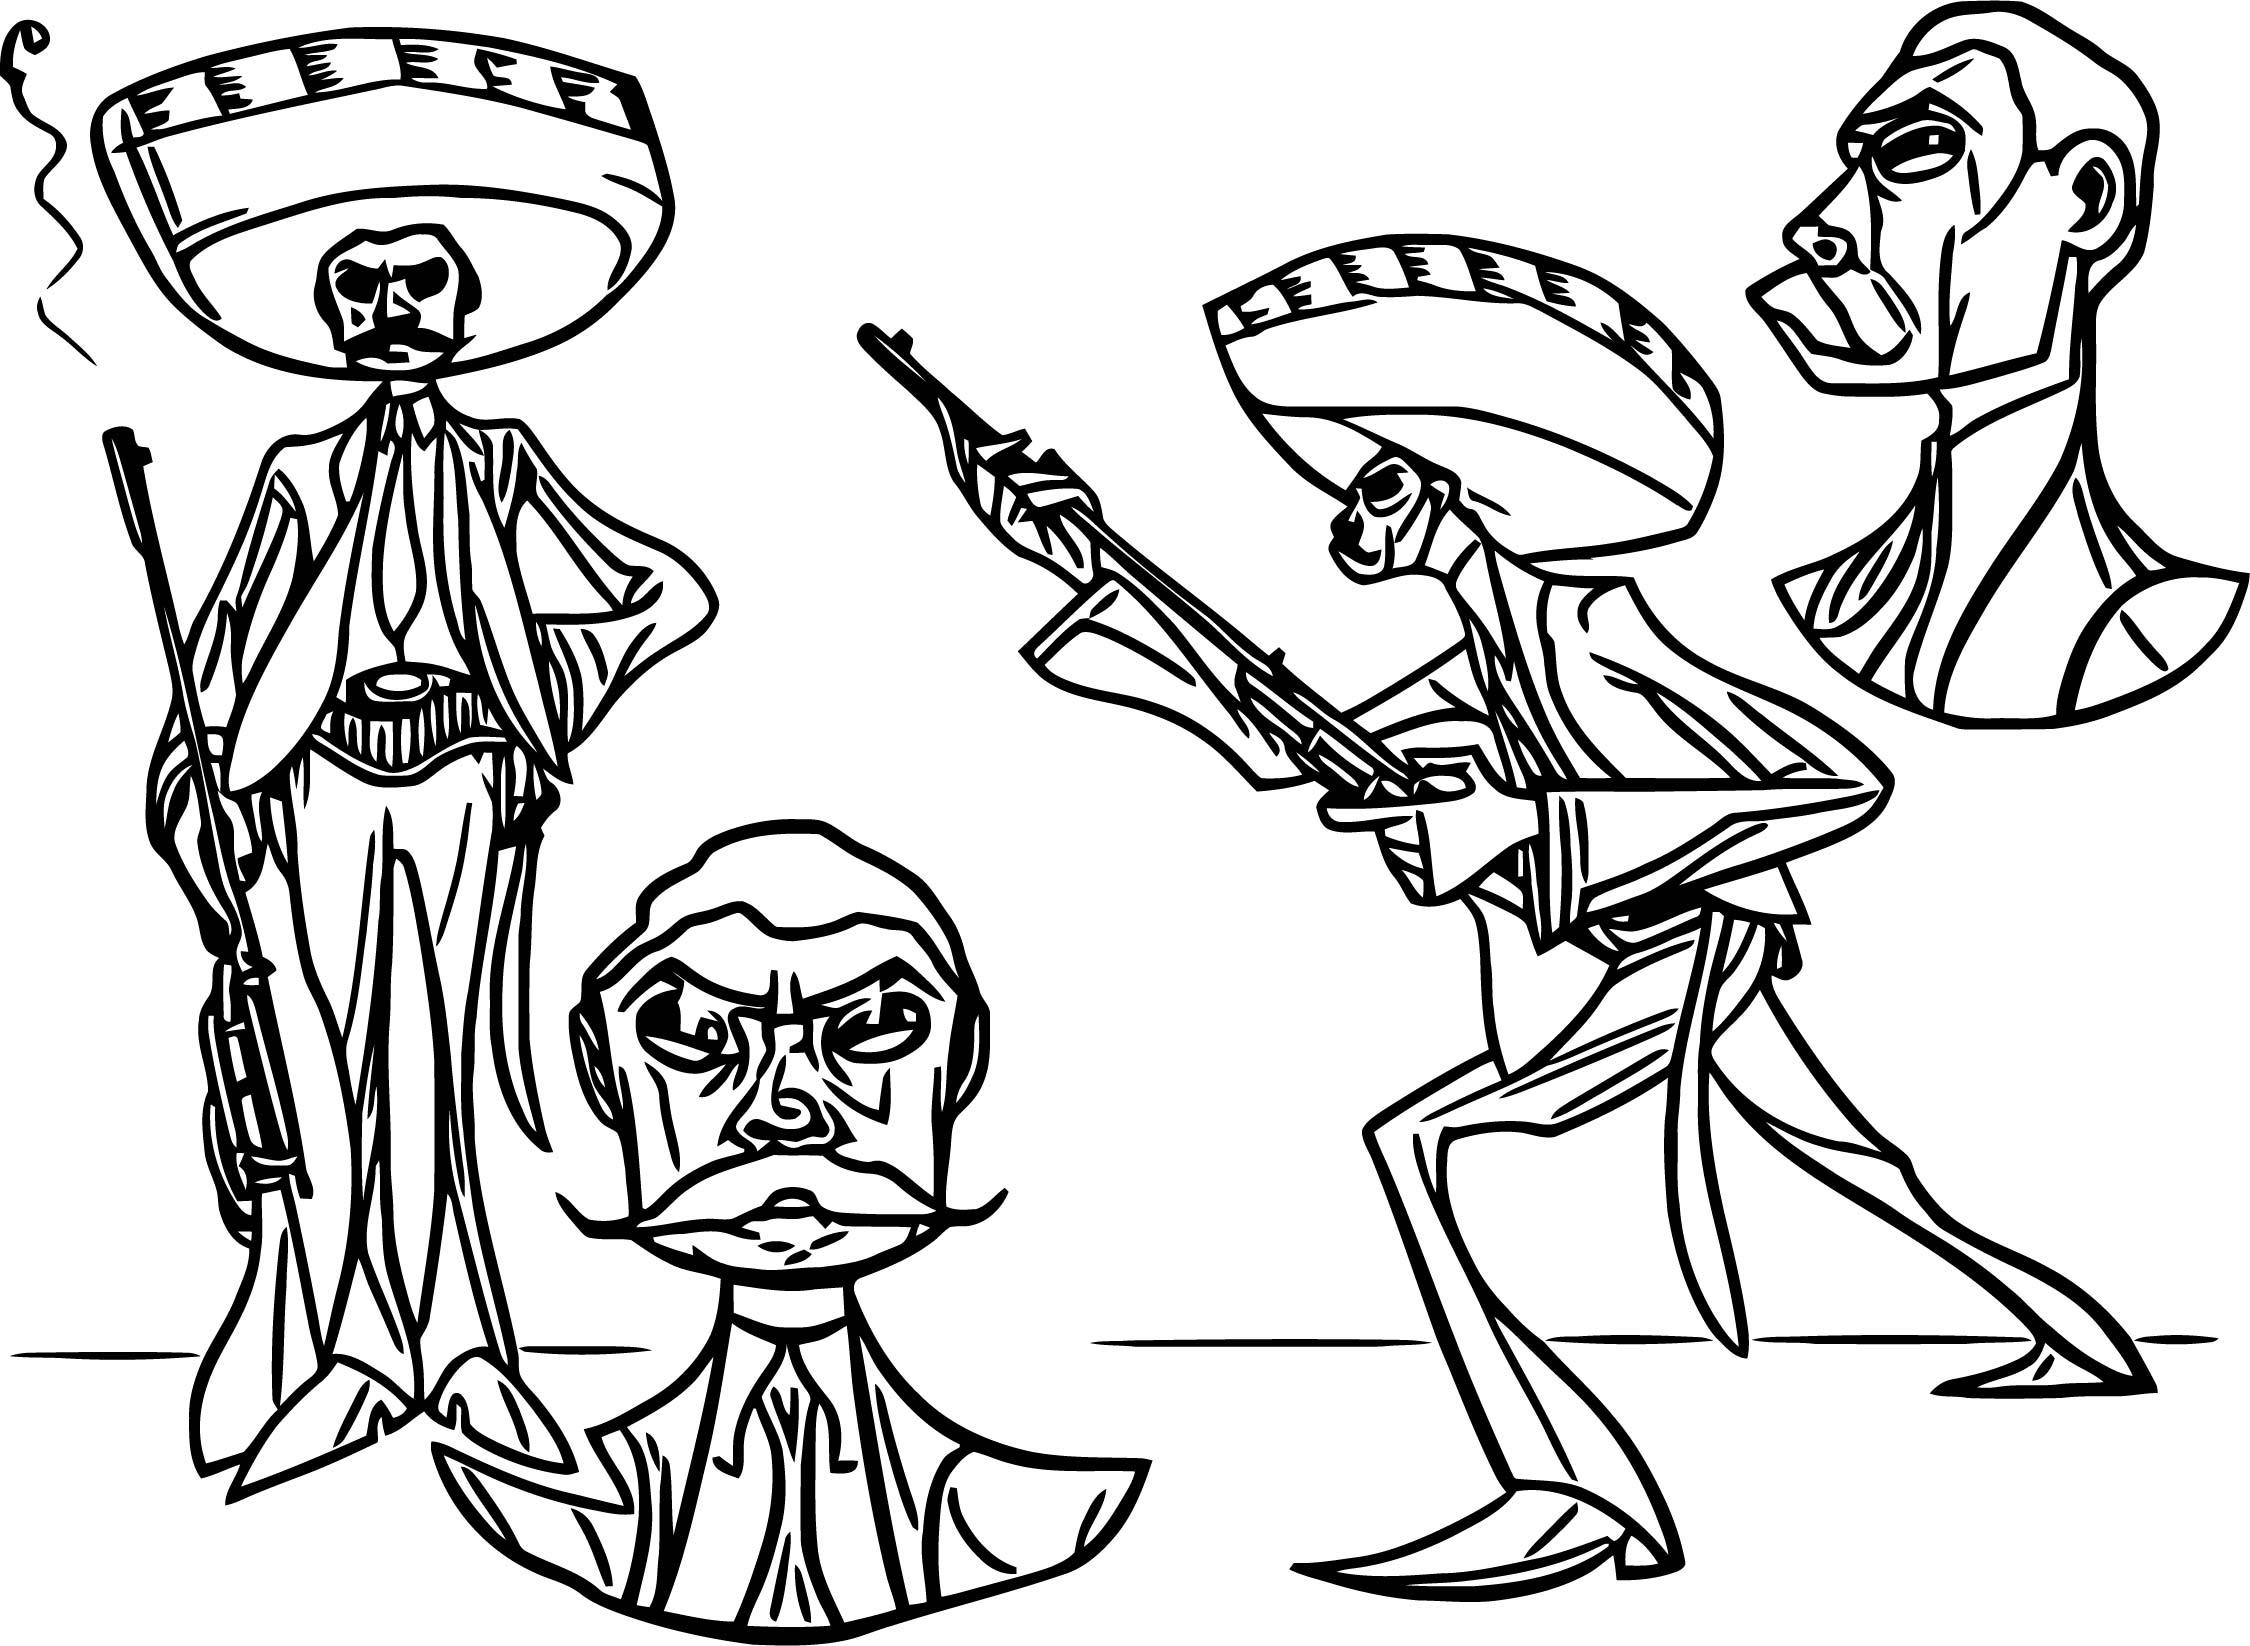 Zapata Cowboy Cartoonized Coloring Page